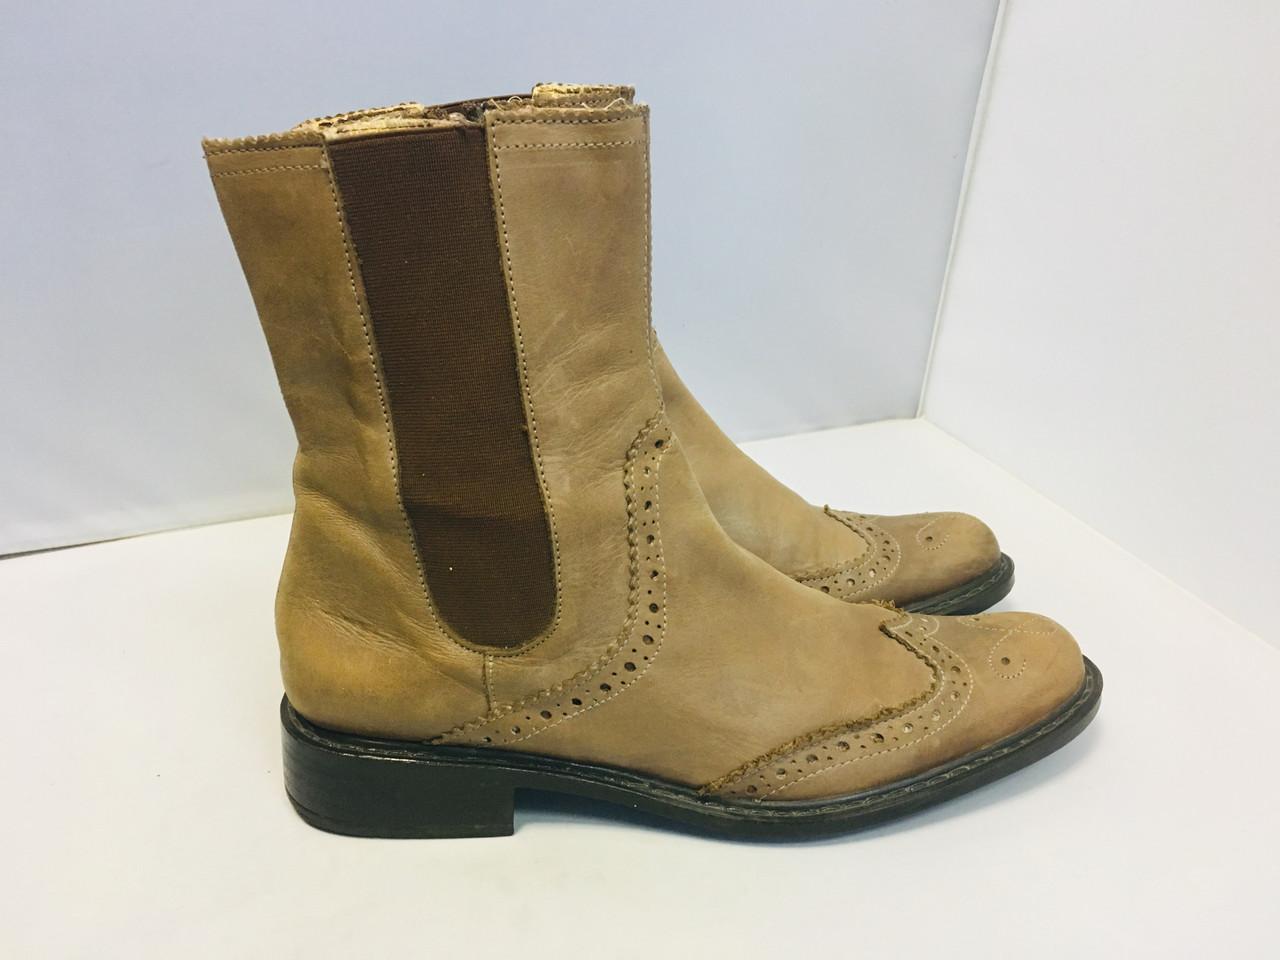 Женские ботинки Gortz, 38 размер